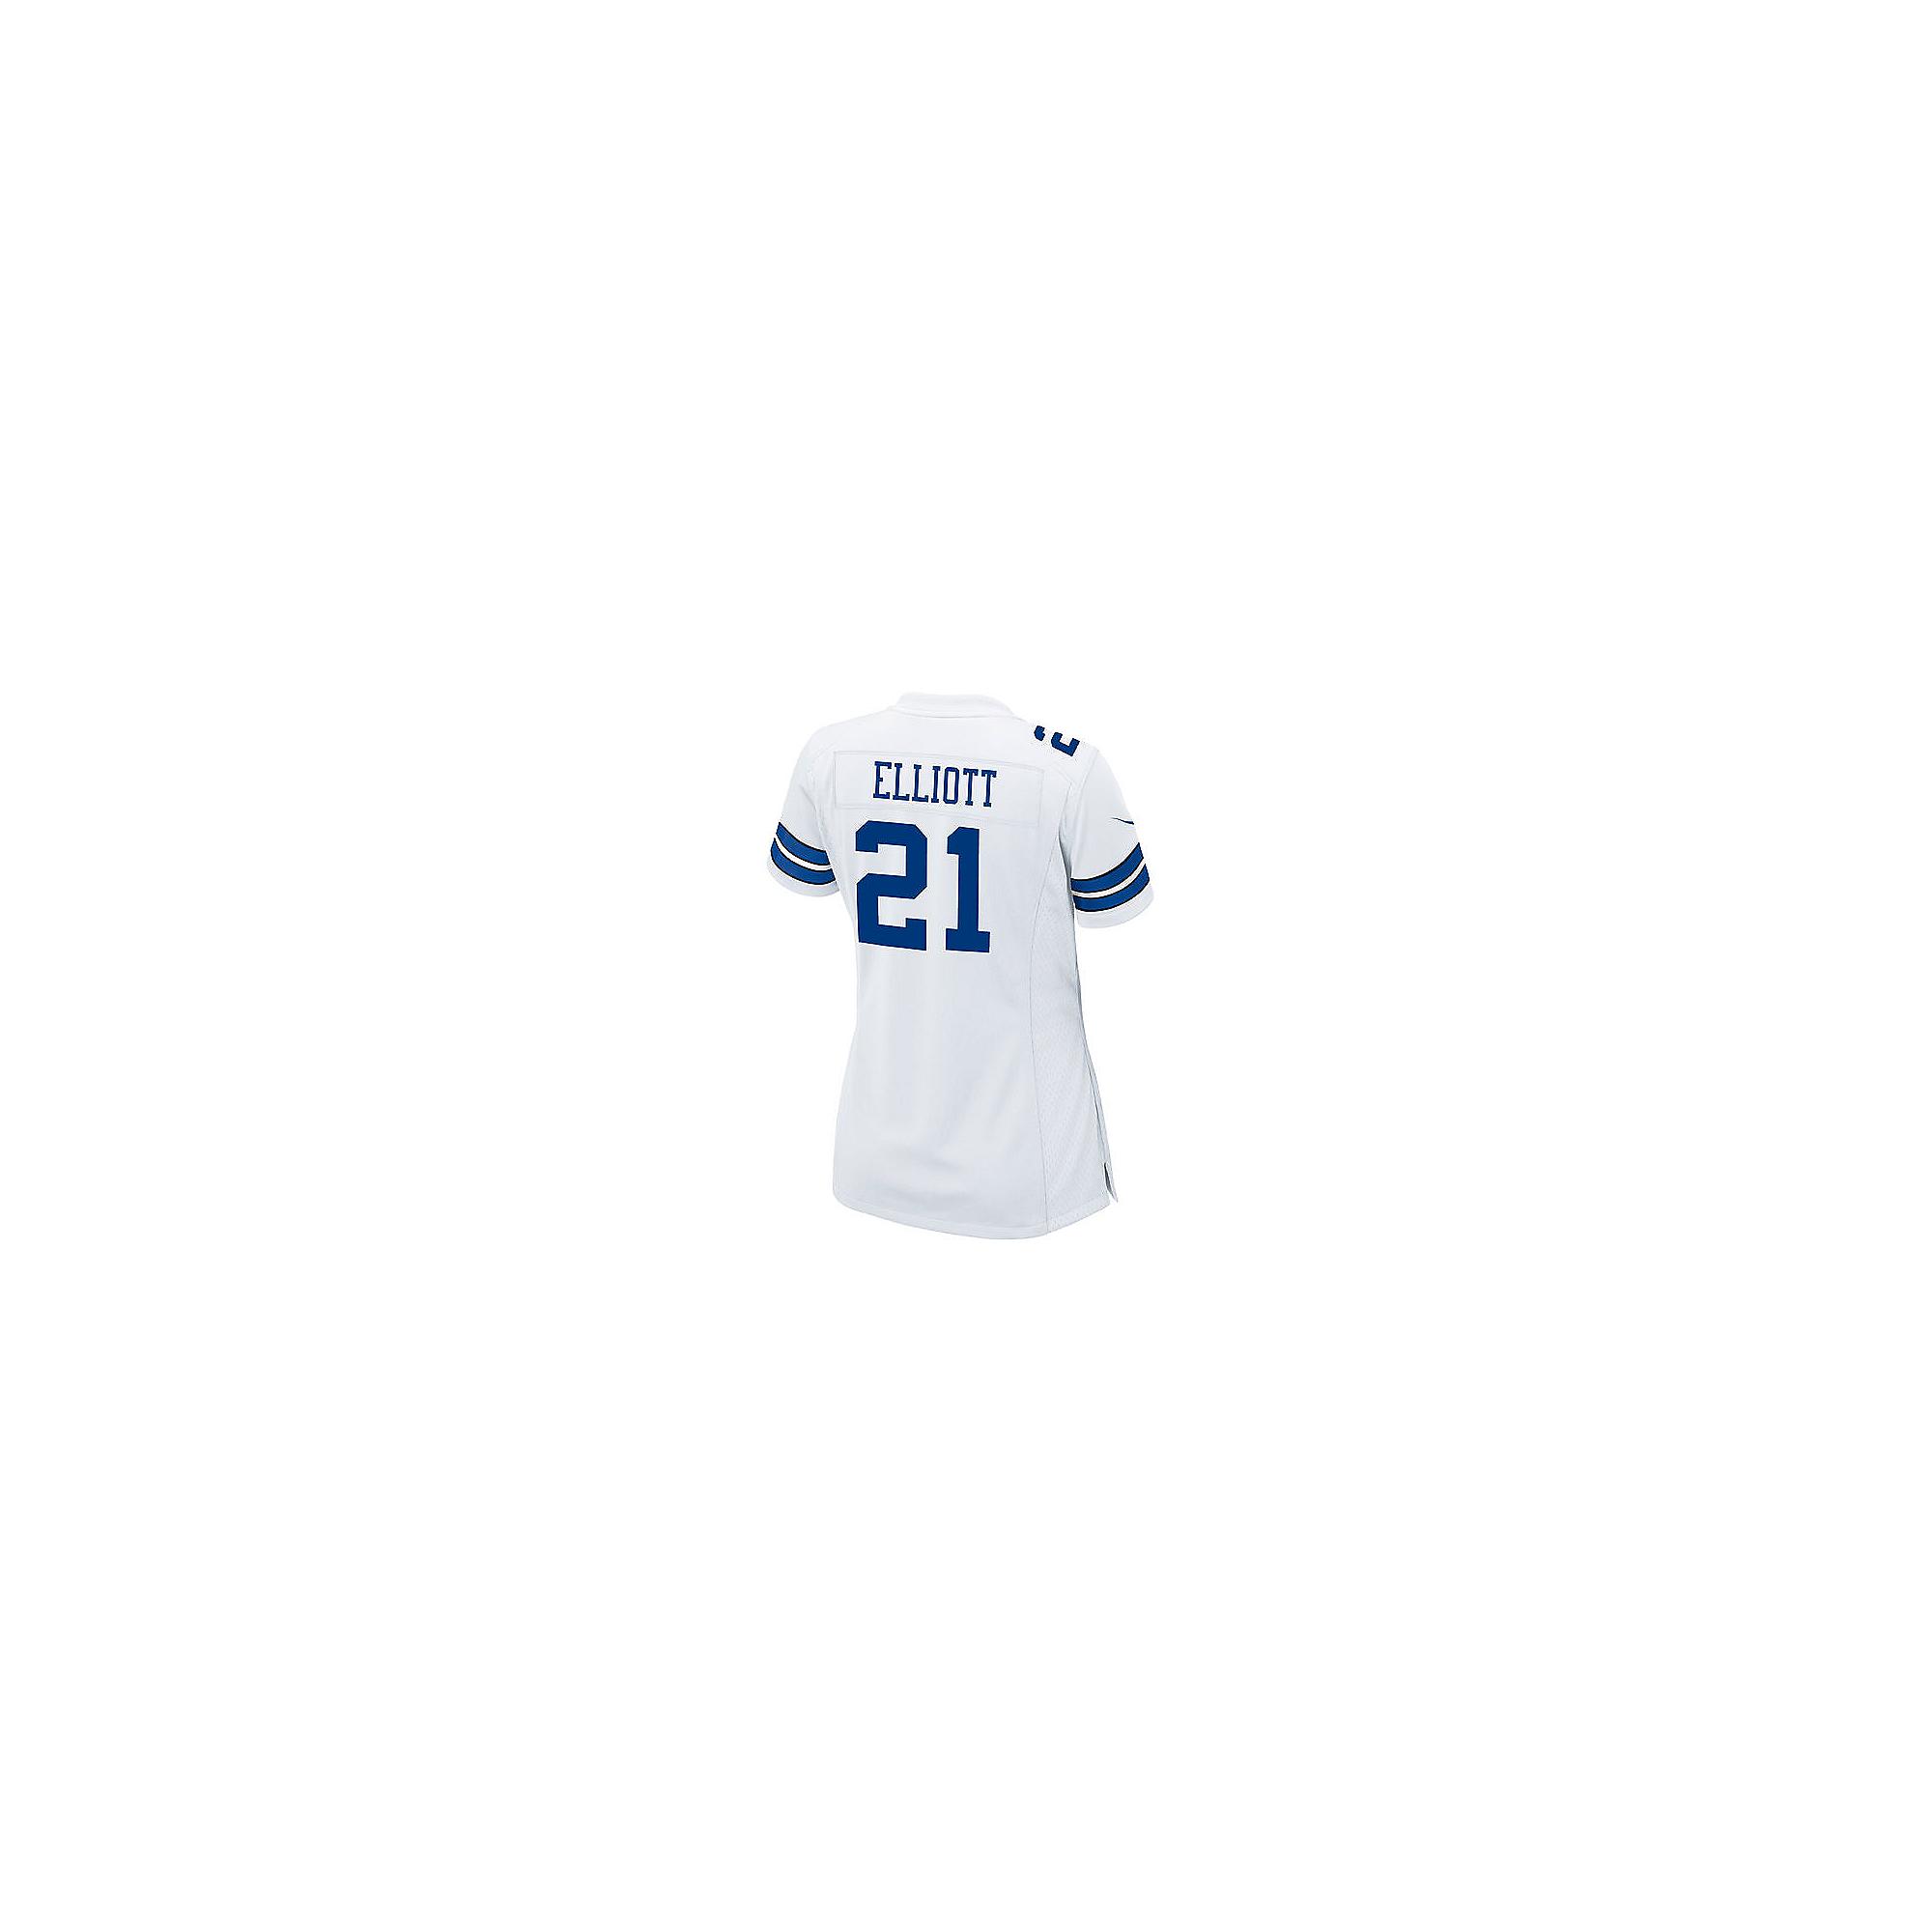 5586b5b9 Dallas Cowboys Womens Ezekiel Elliott Nike White Game Replica Jersey    Dallas Cowboys Pro Shop